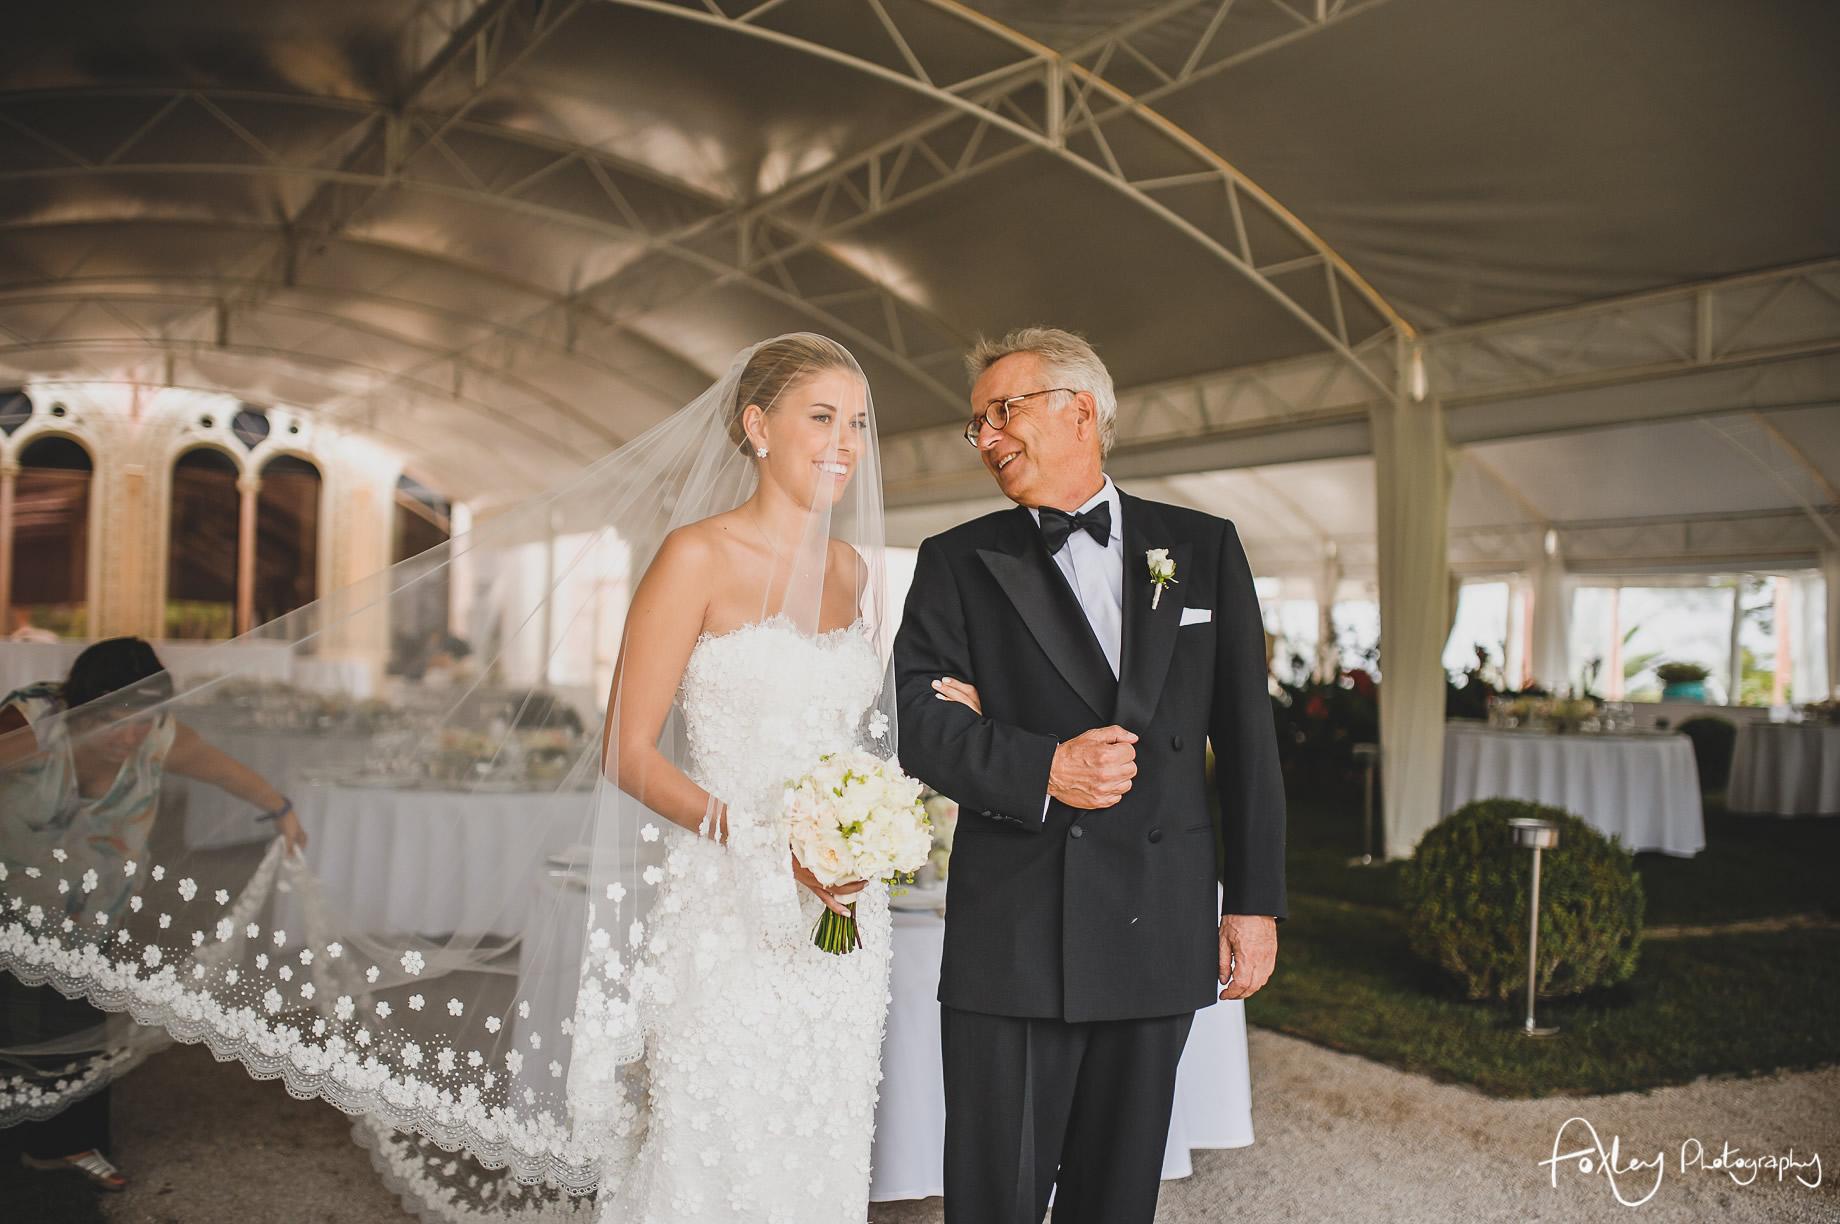 Jil and Will's Wedding at Villa Ephrussi De Rothschild 086